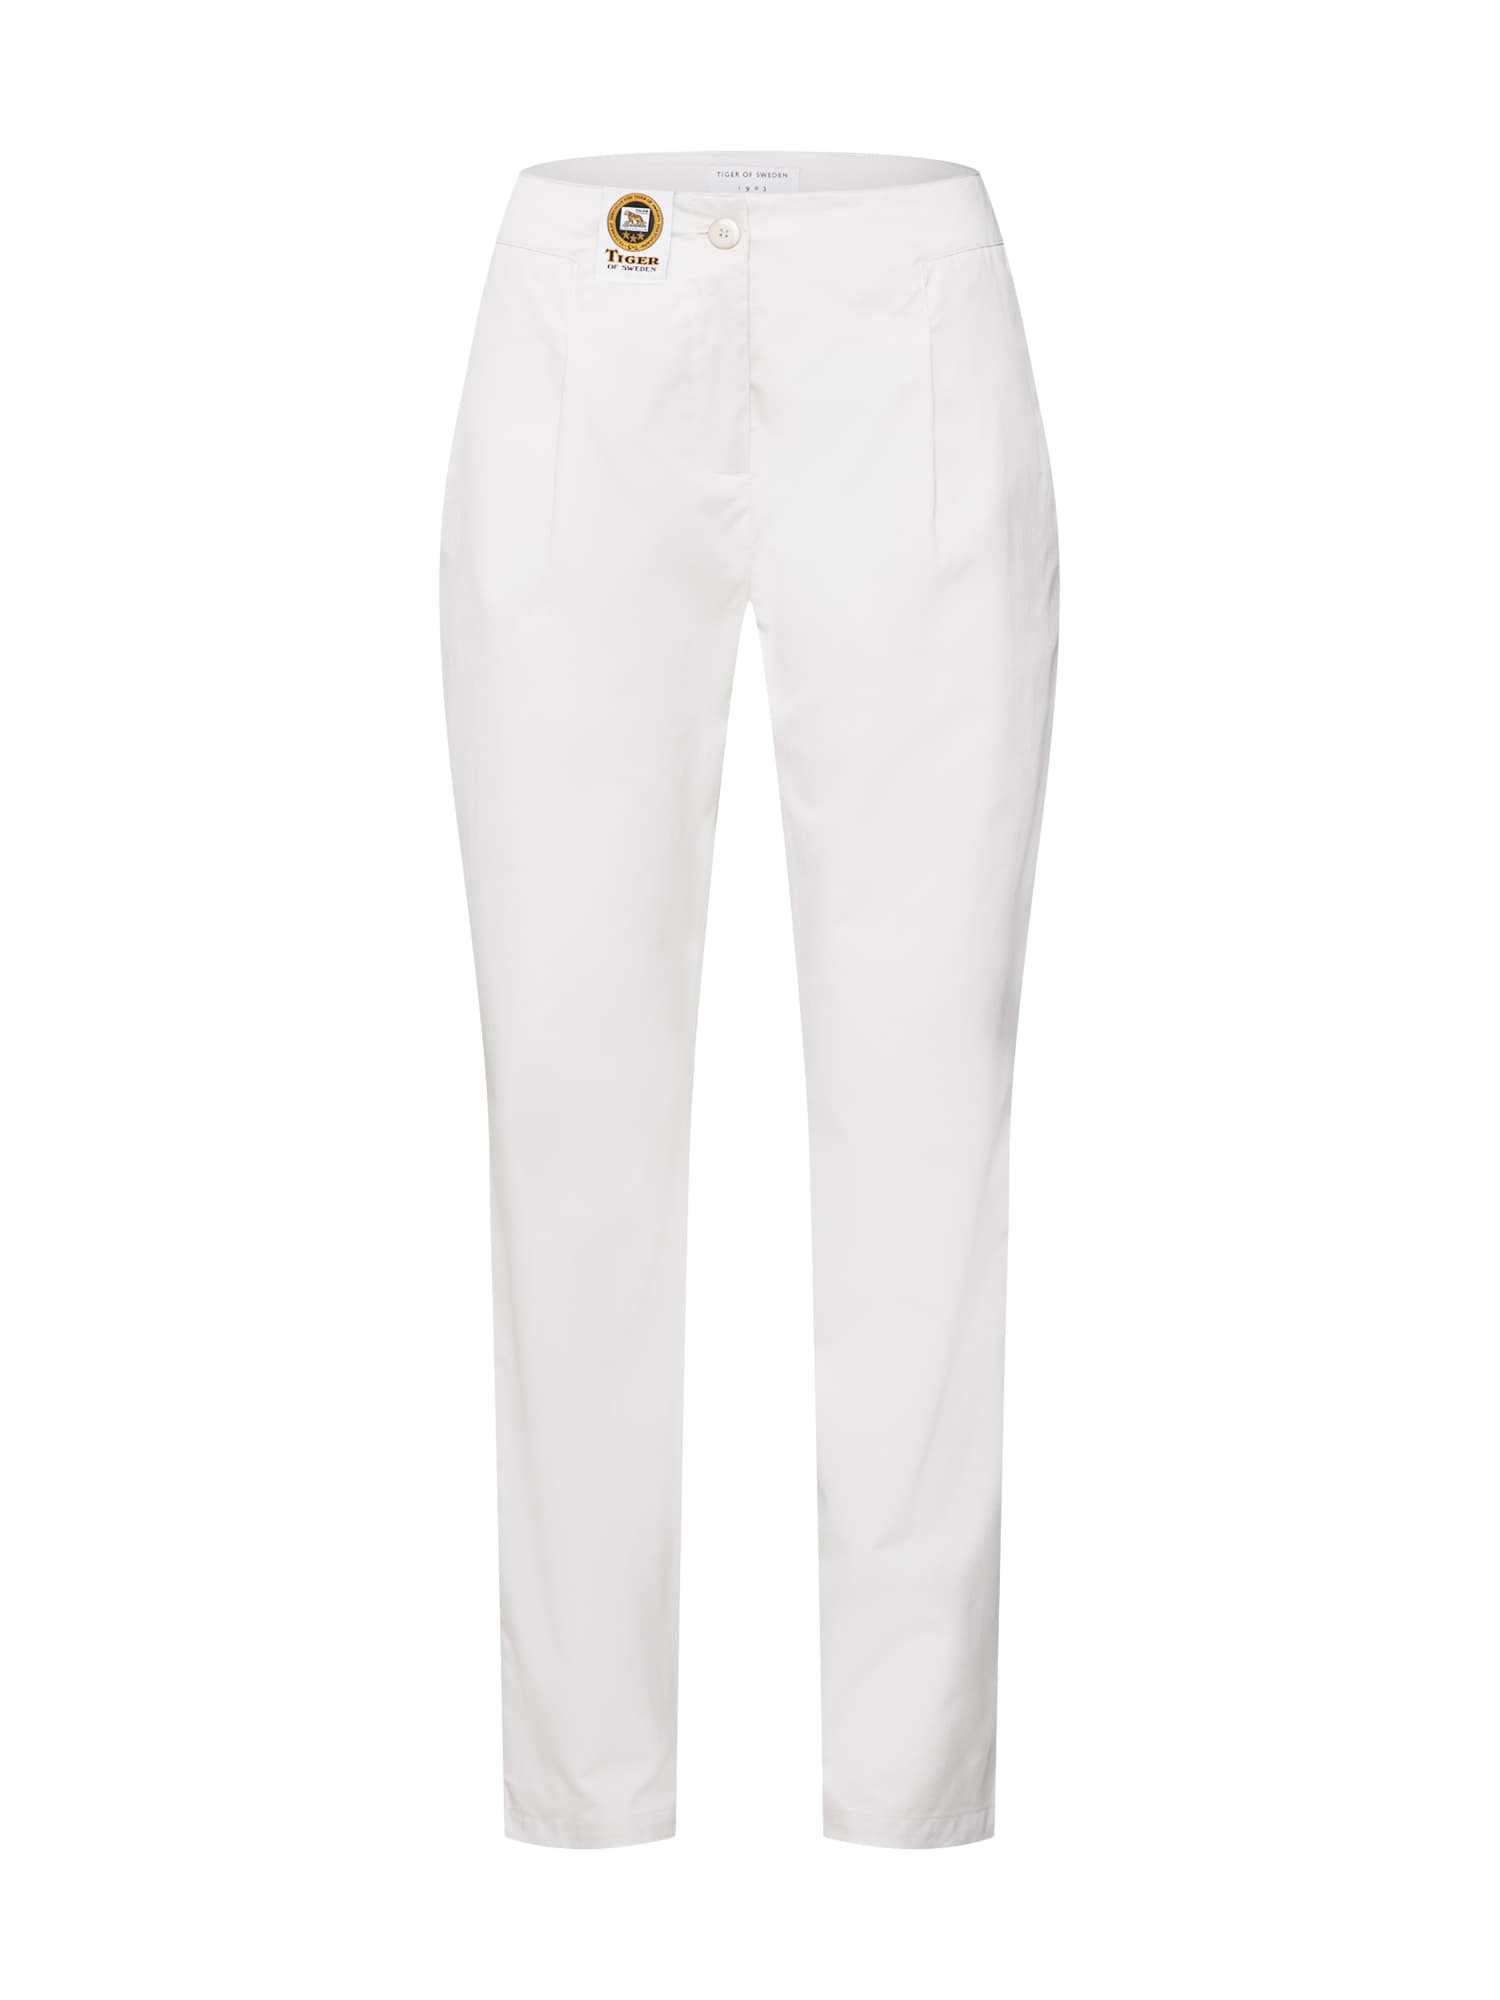 Kalhoty se sklady v pase ARA krémová Tiger Of Sweden